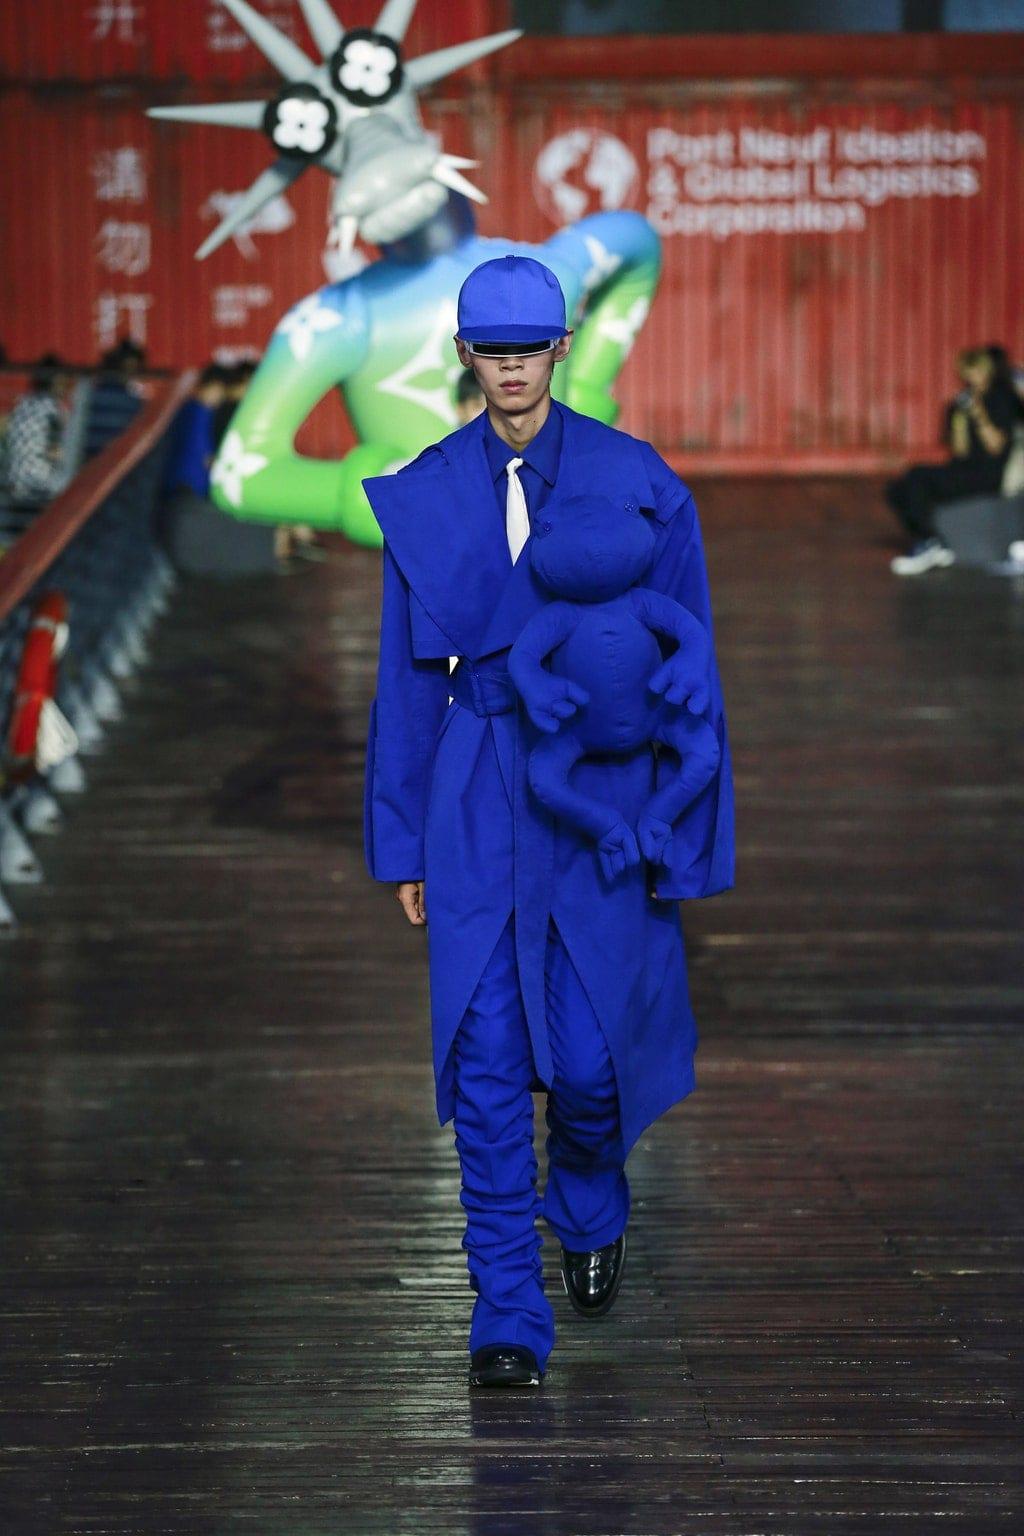 Louis Vuitton Spring Summer 2021 Menswear Shanghai. RUNWAY MAGAZINE ® Collections. RUNWAY NOW / RUNWAY NEW